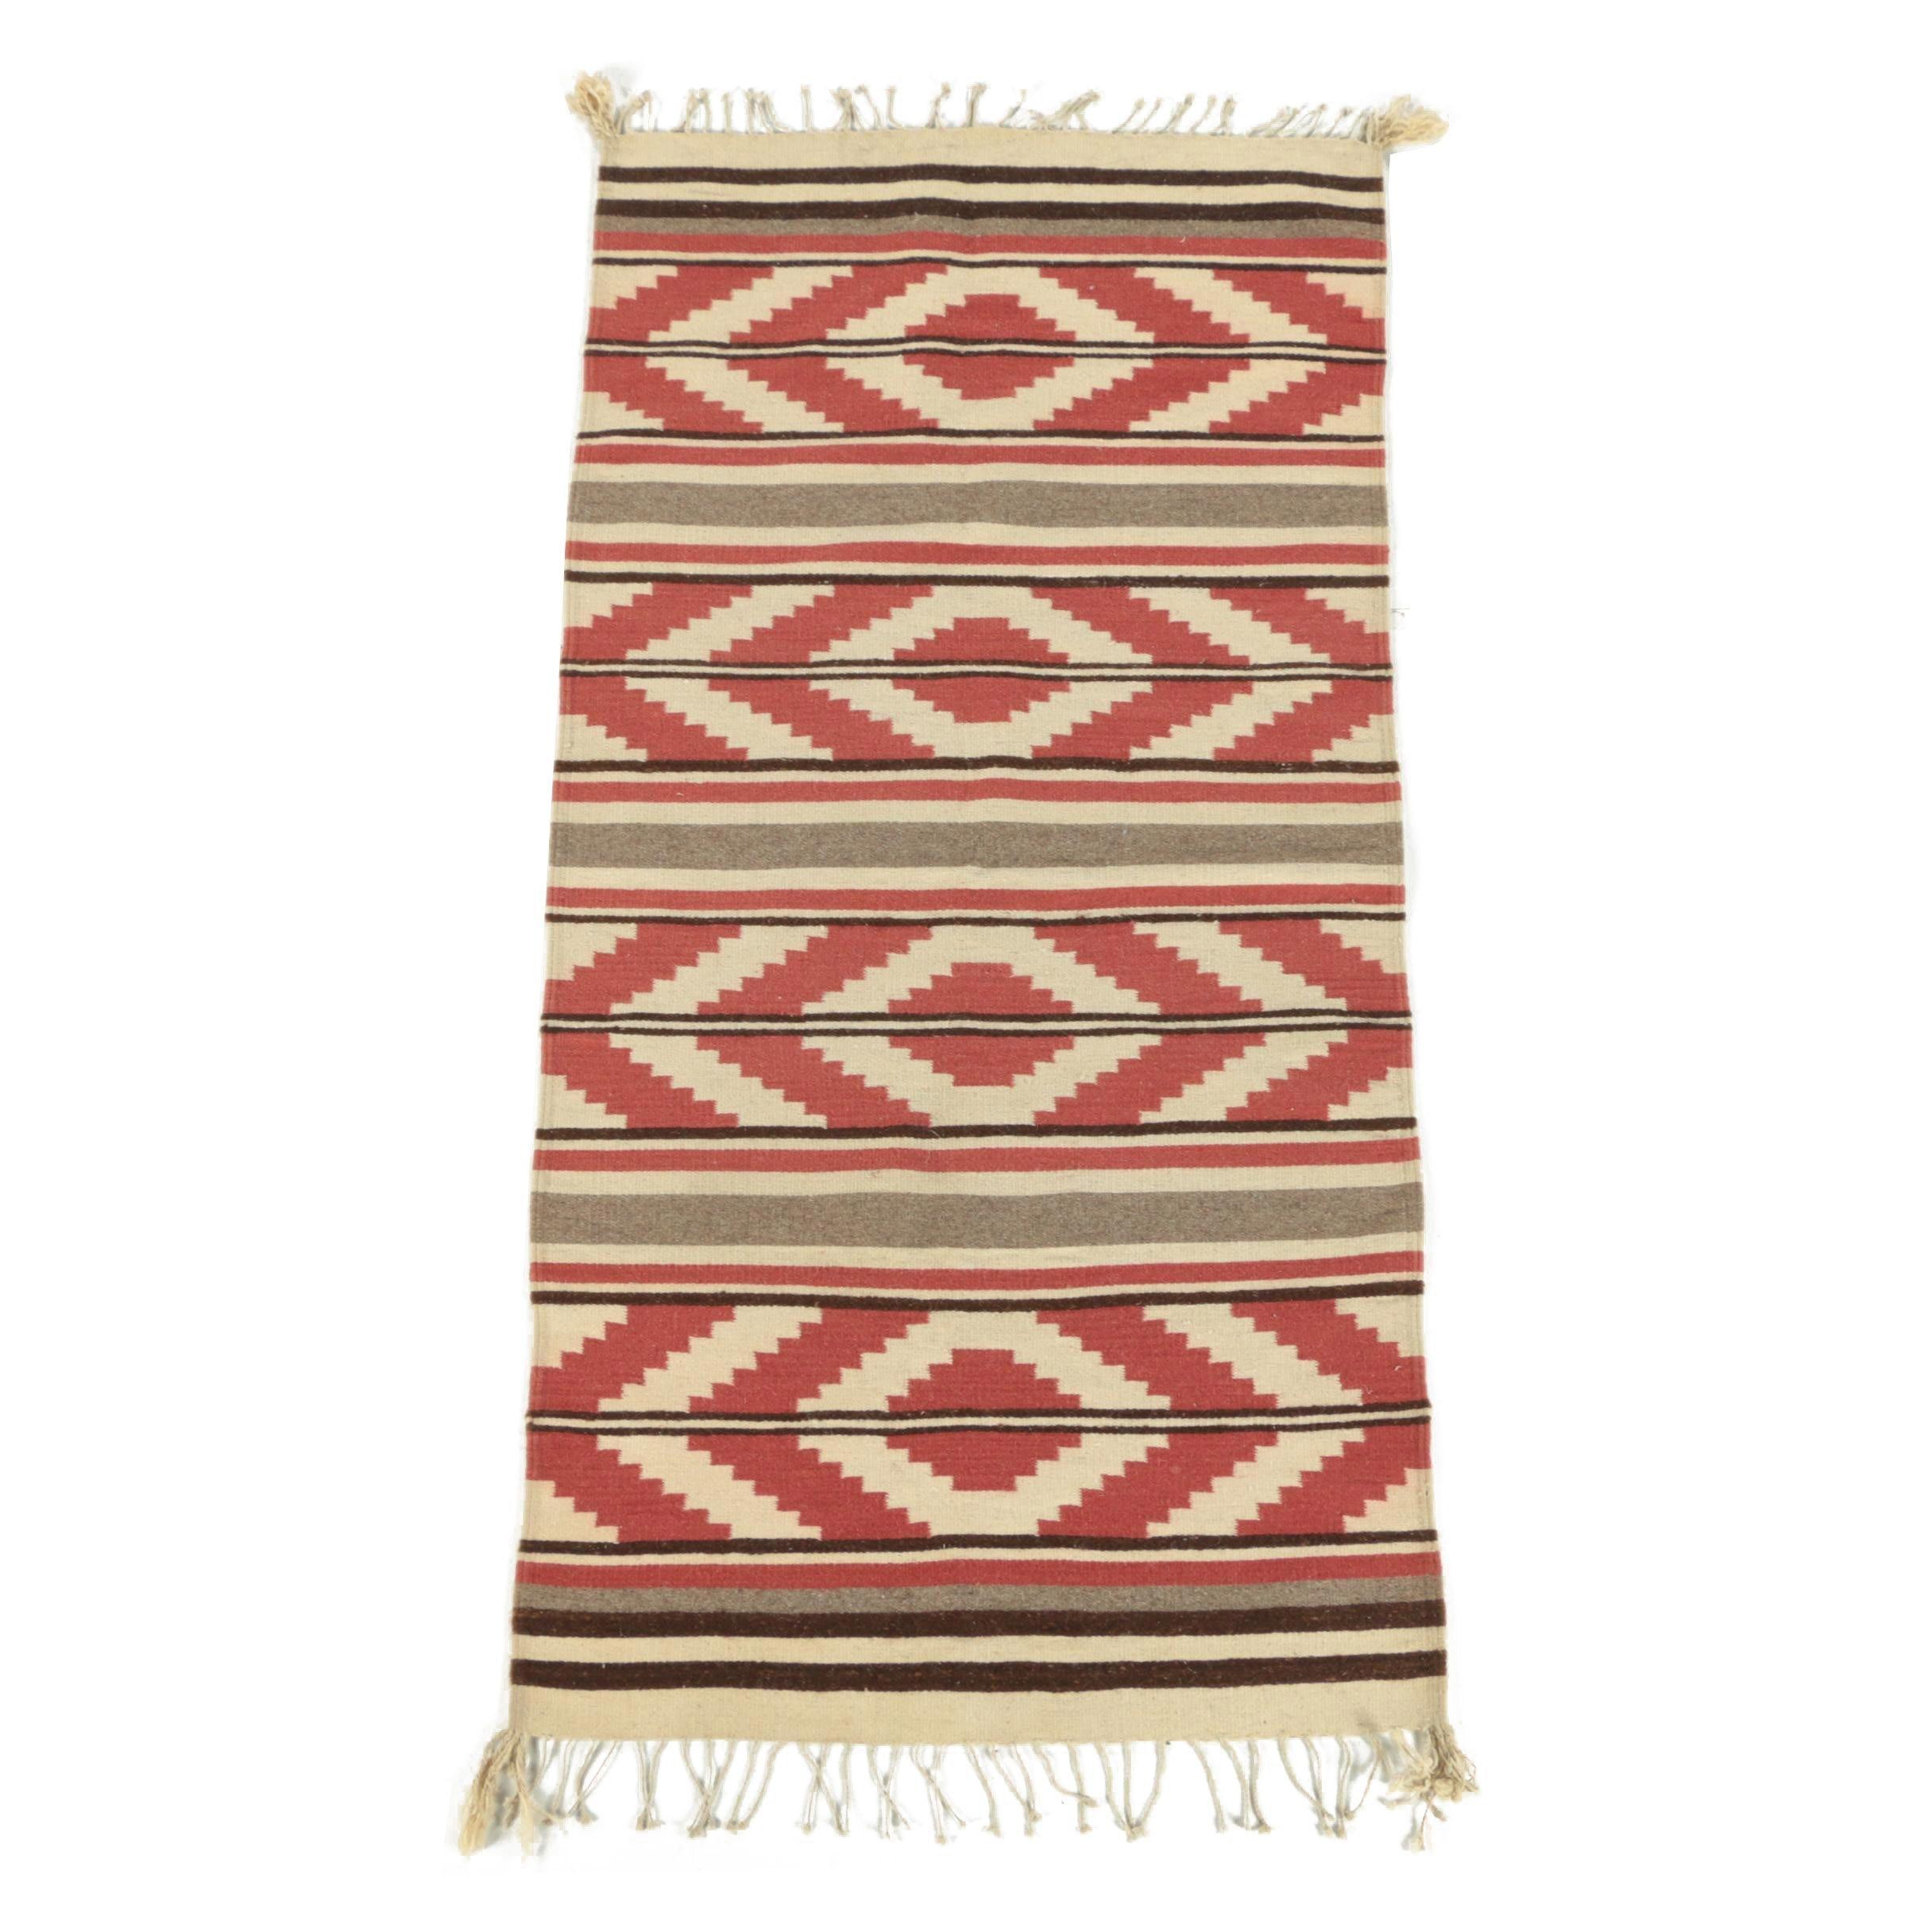 Handwoven Native American Style Wool Runner